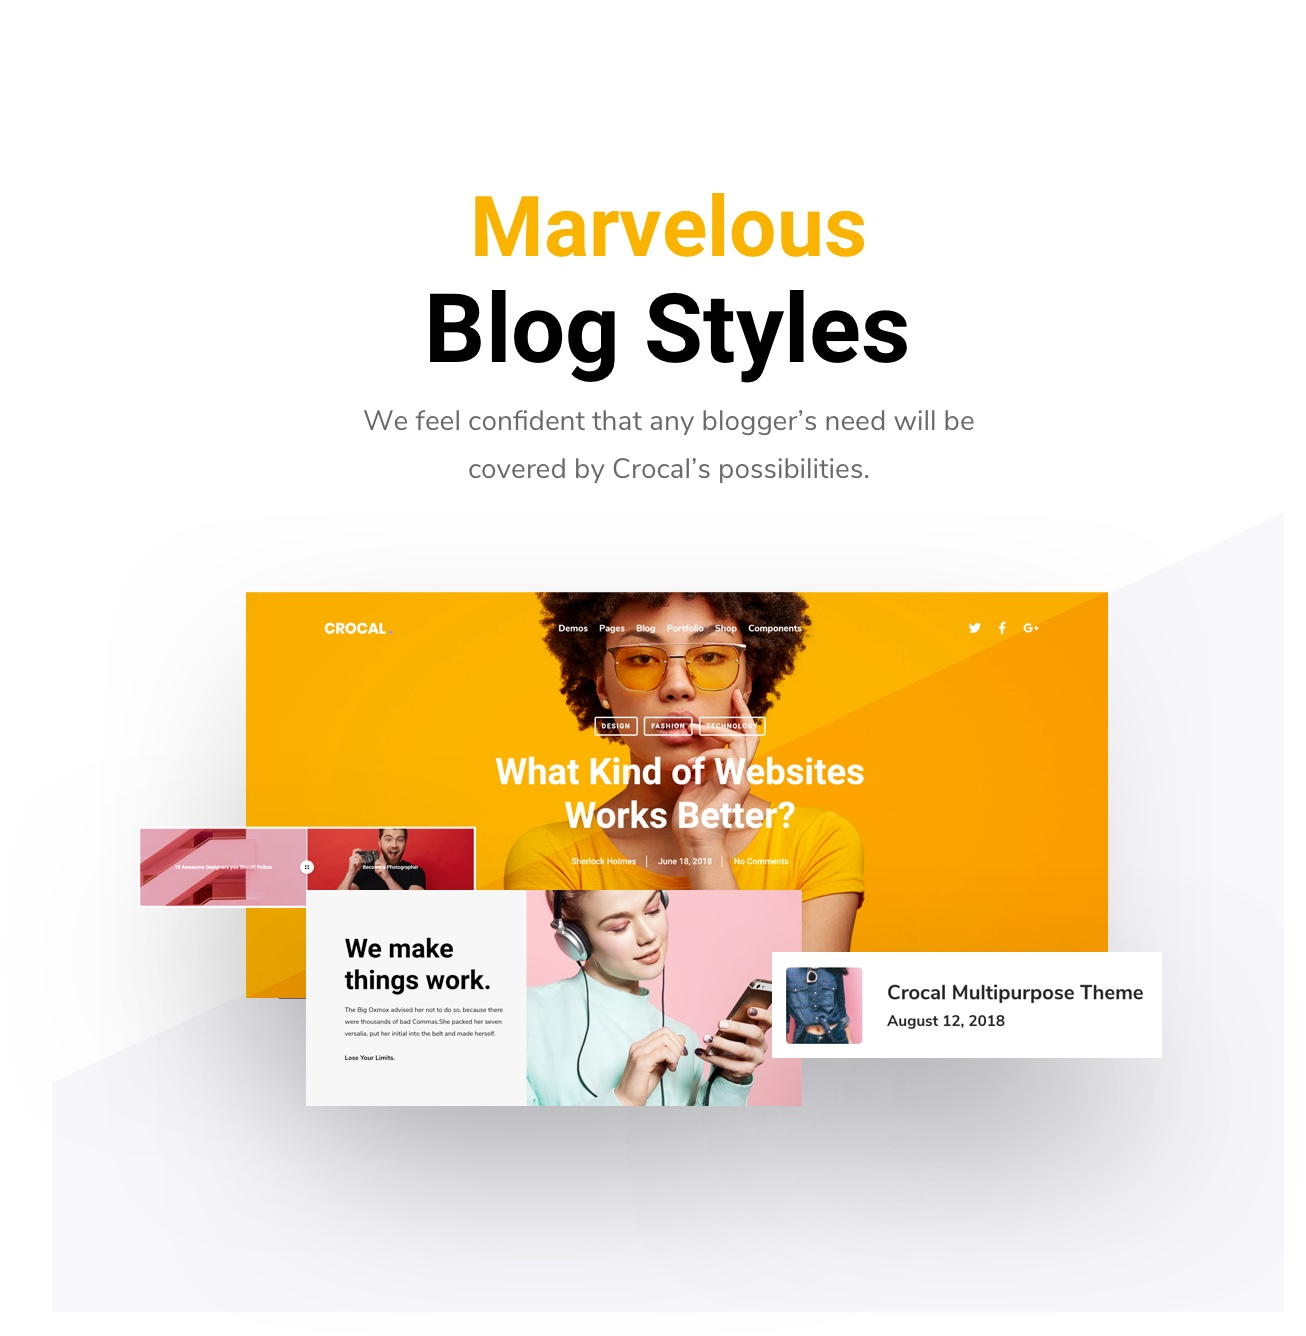 Crocal Blog styles